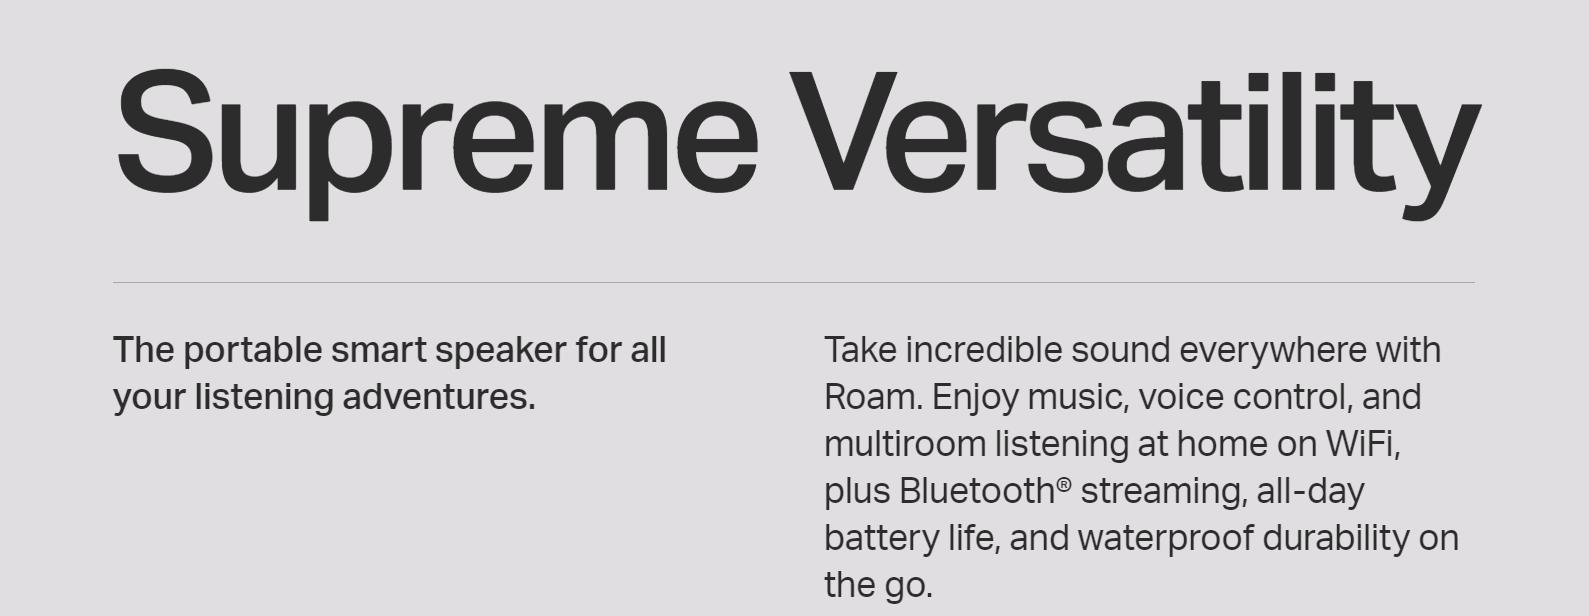 Sonos uses strategic fonts